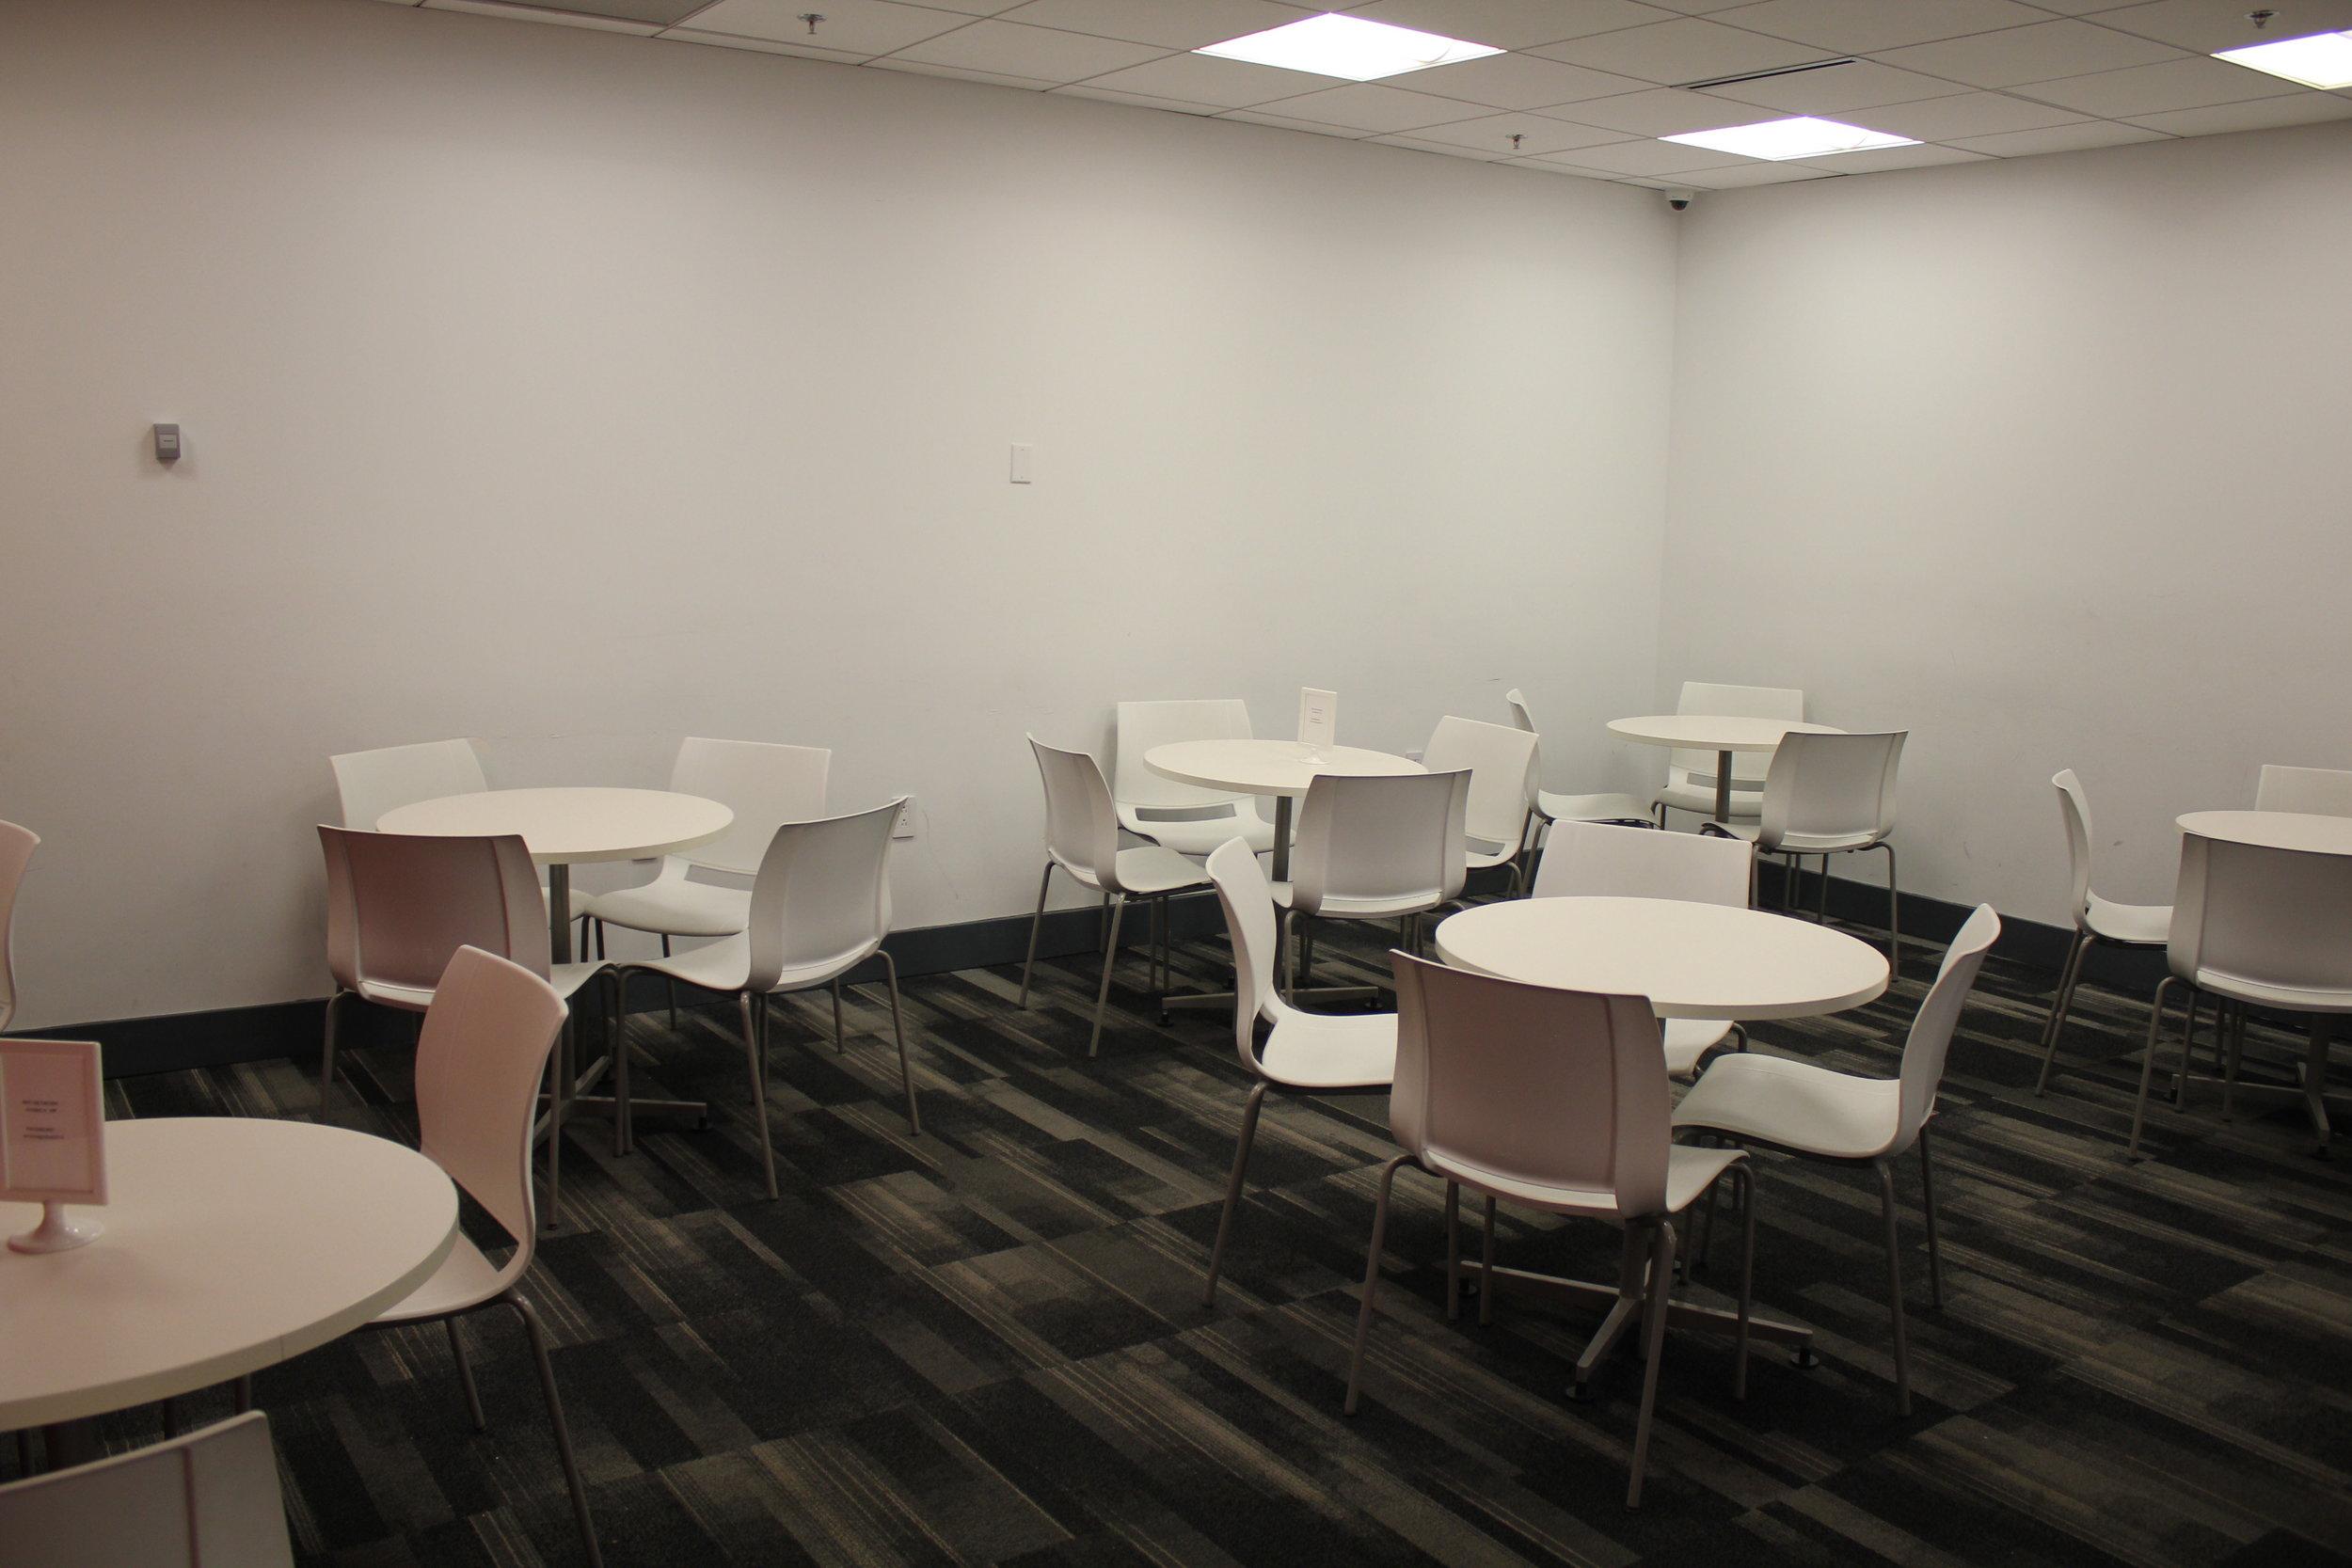 Avianca Lounge Miami – Dining area